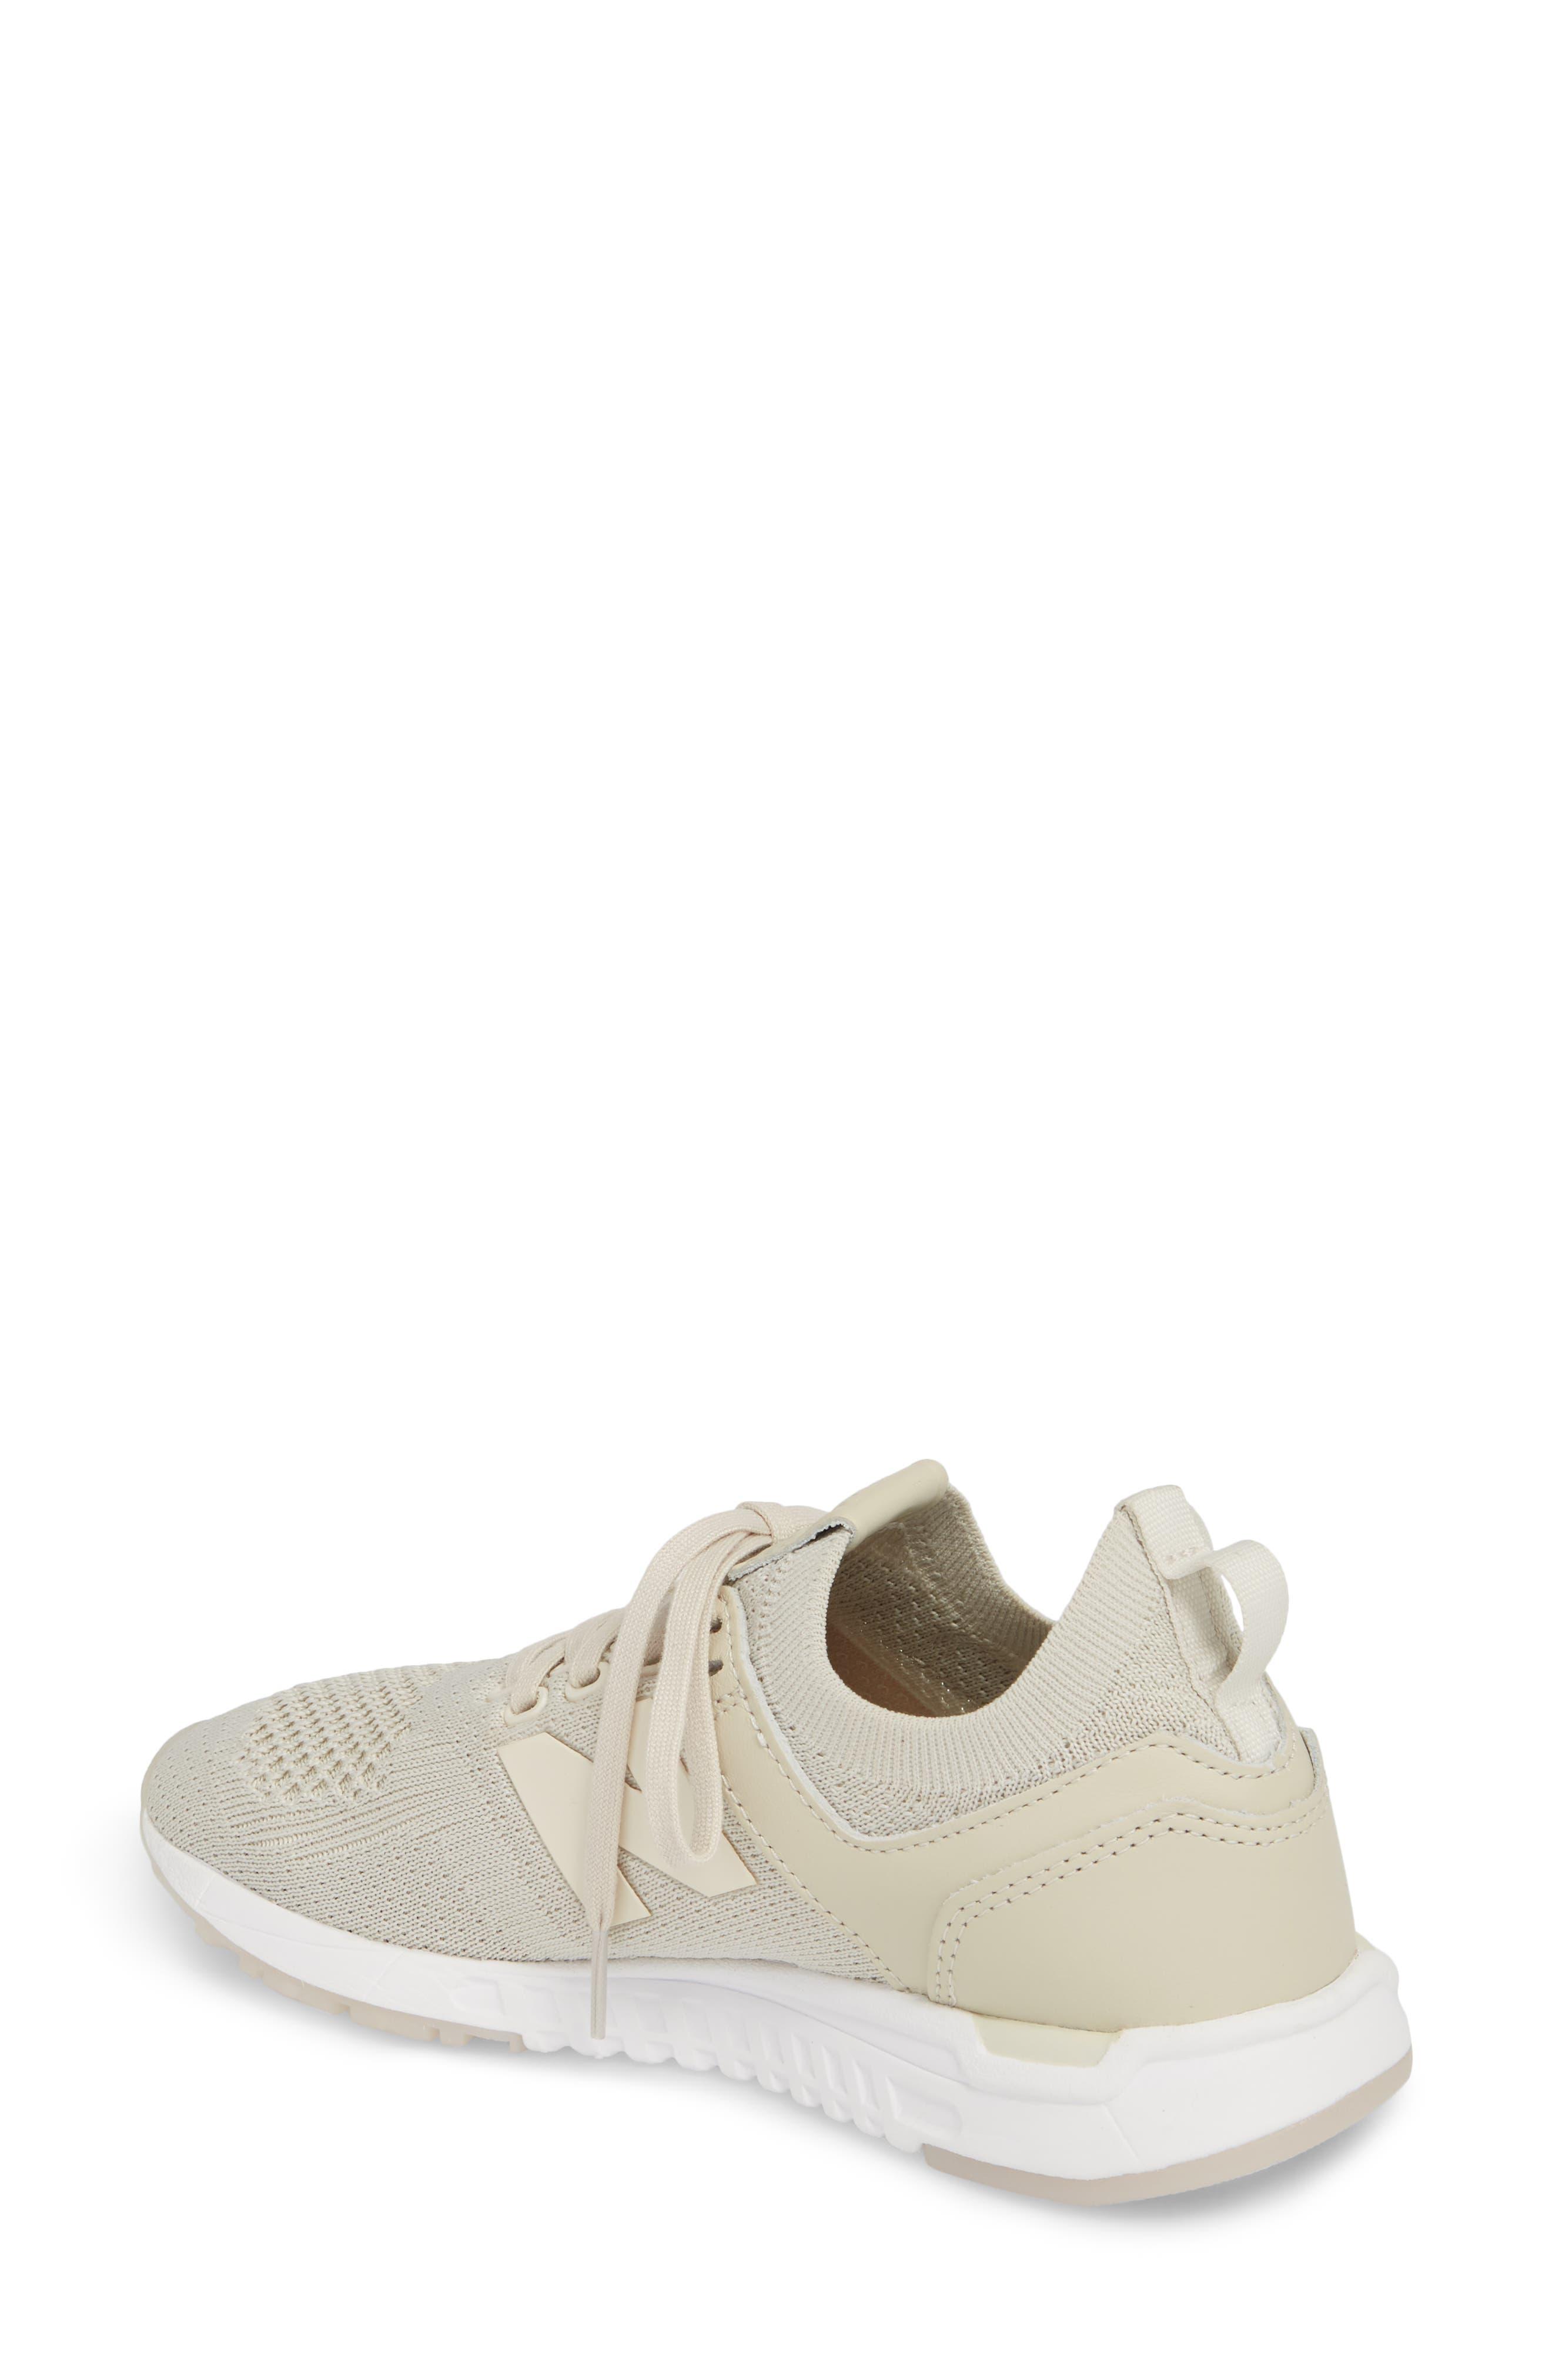 247 Decon Knit Sneaker,                             Alternate thumbnail 5, color,